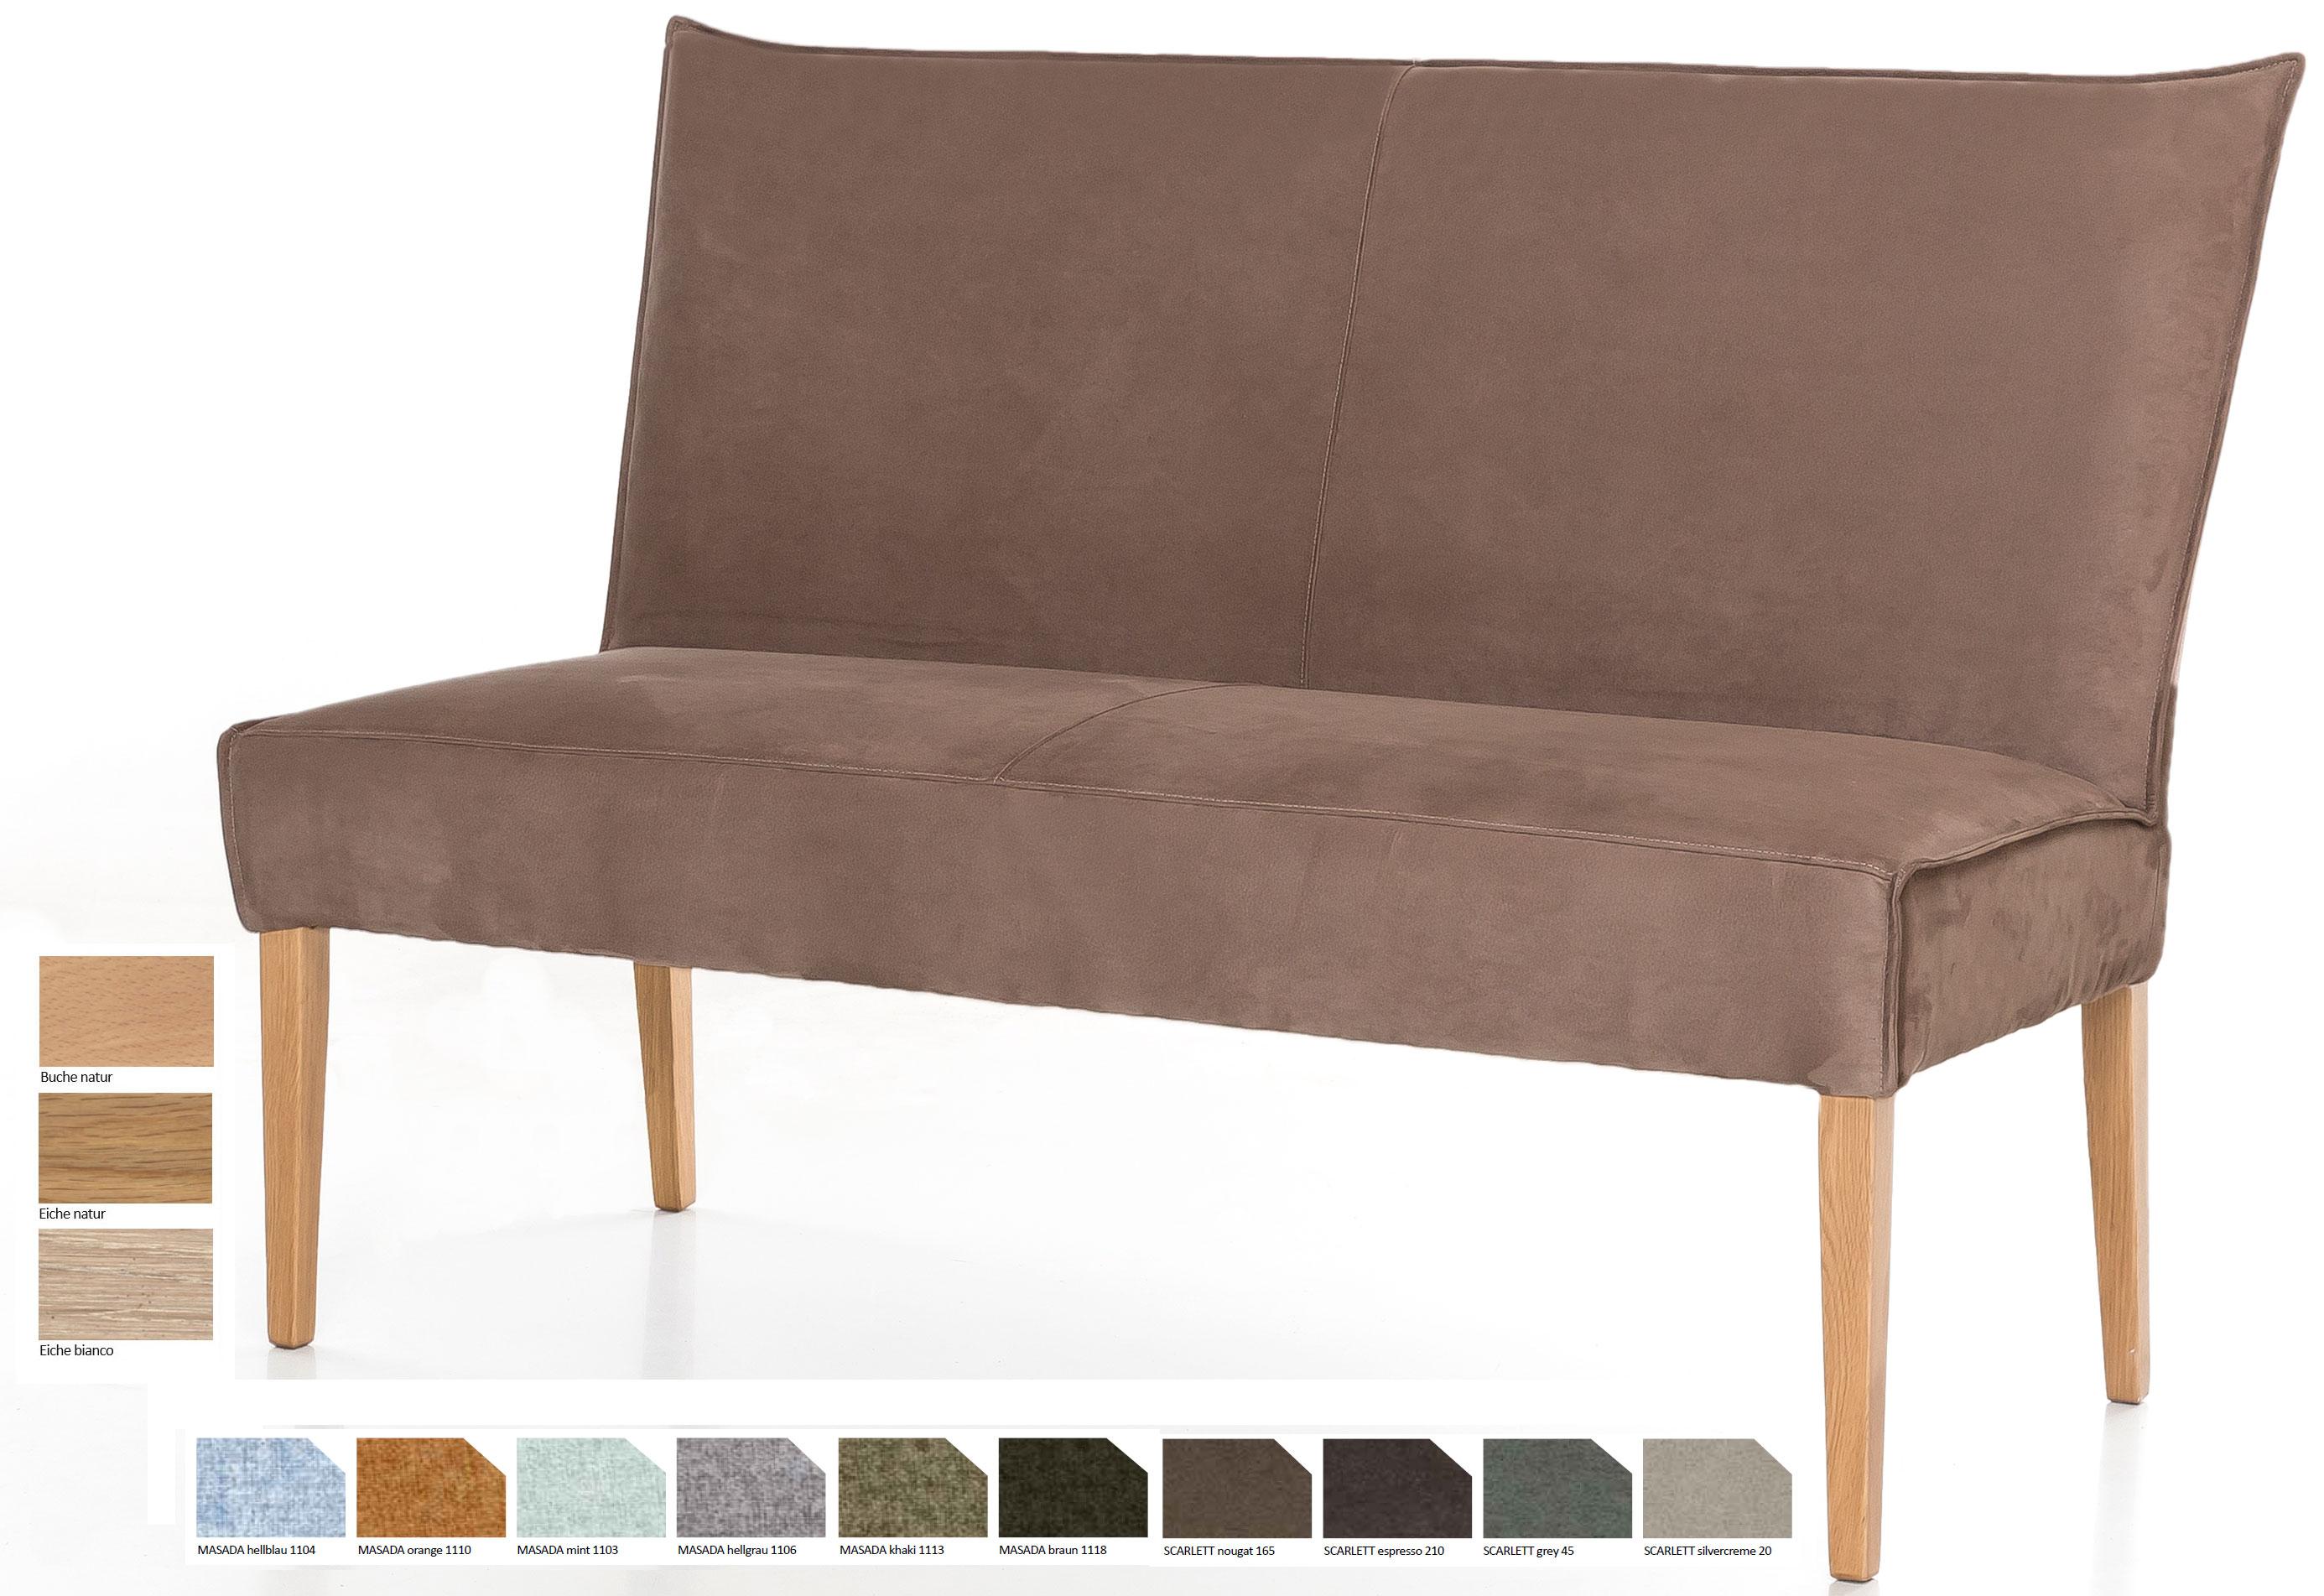 Standard Furniture Kira Polsterbank eiche